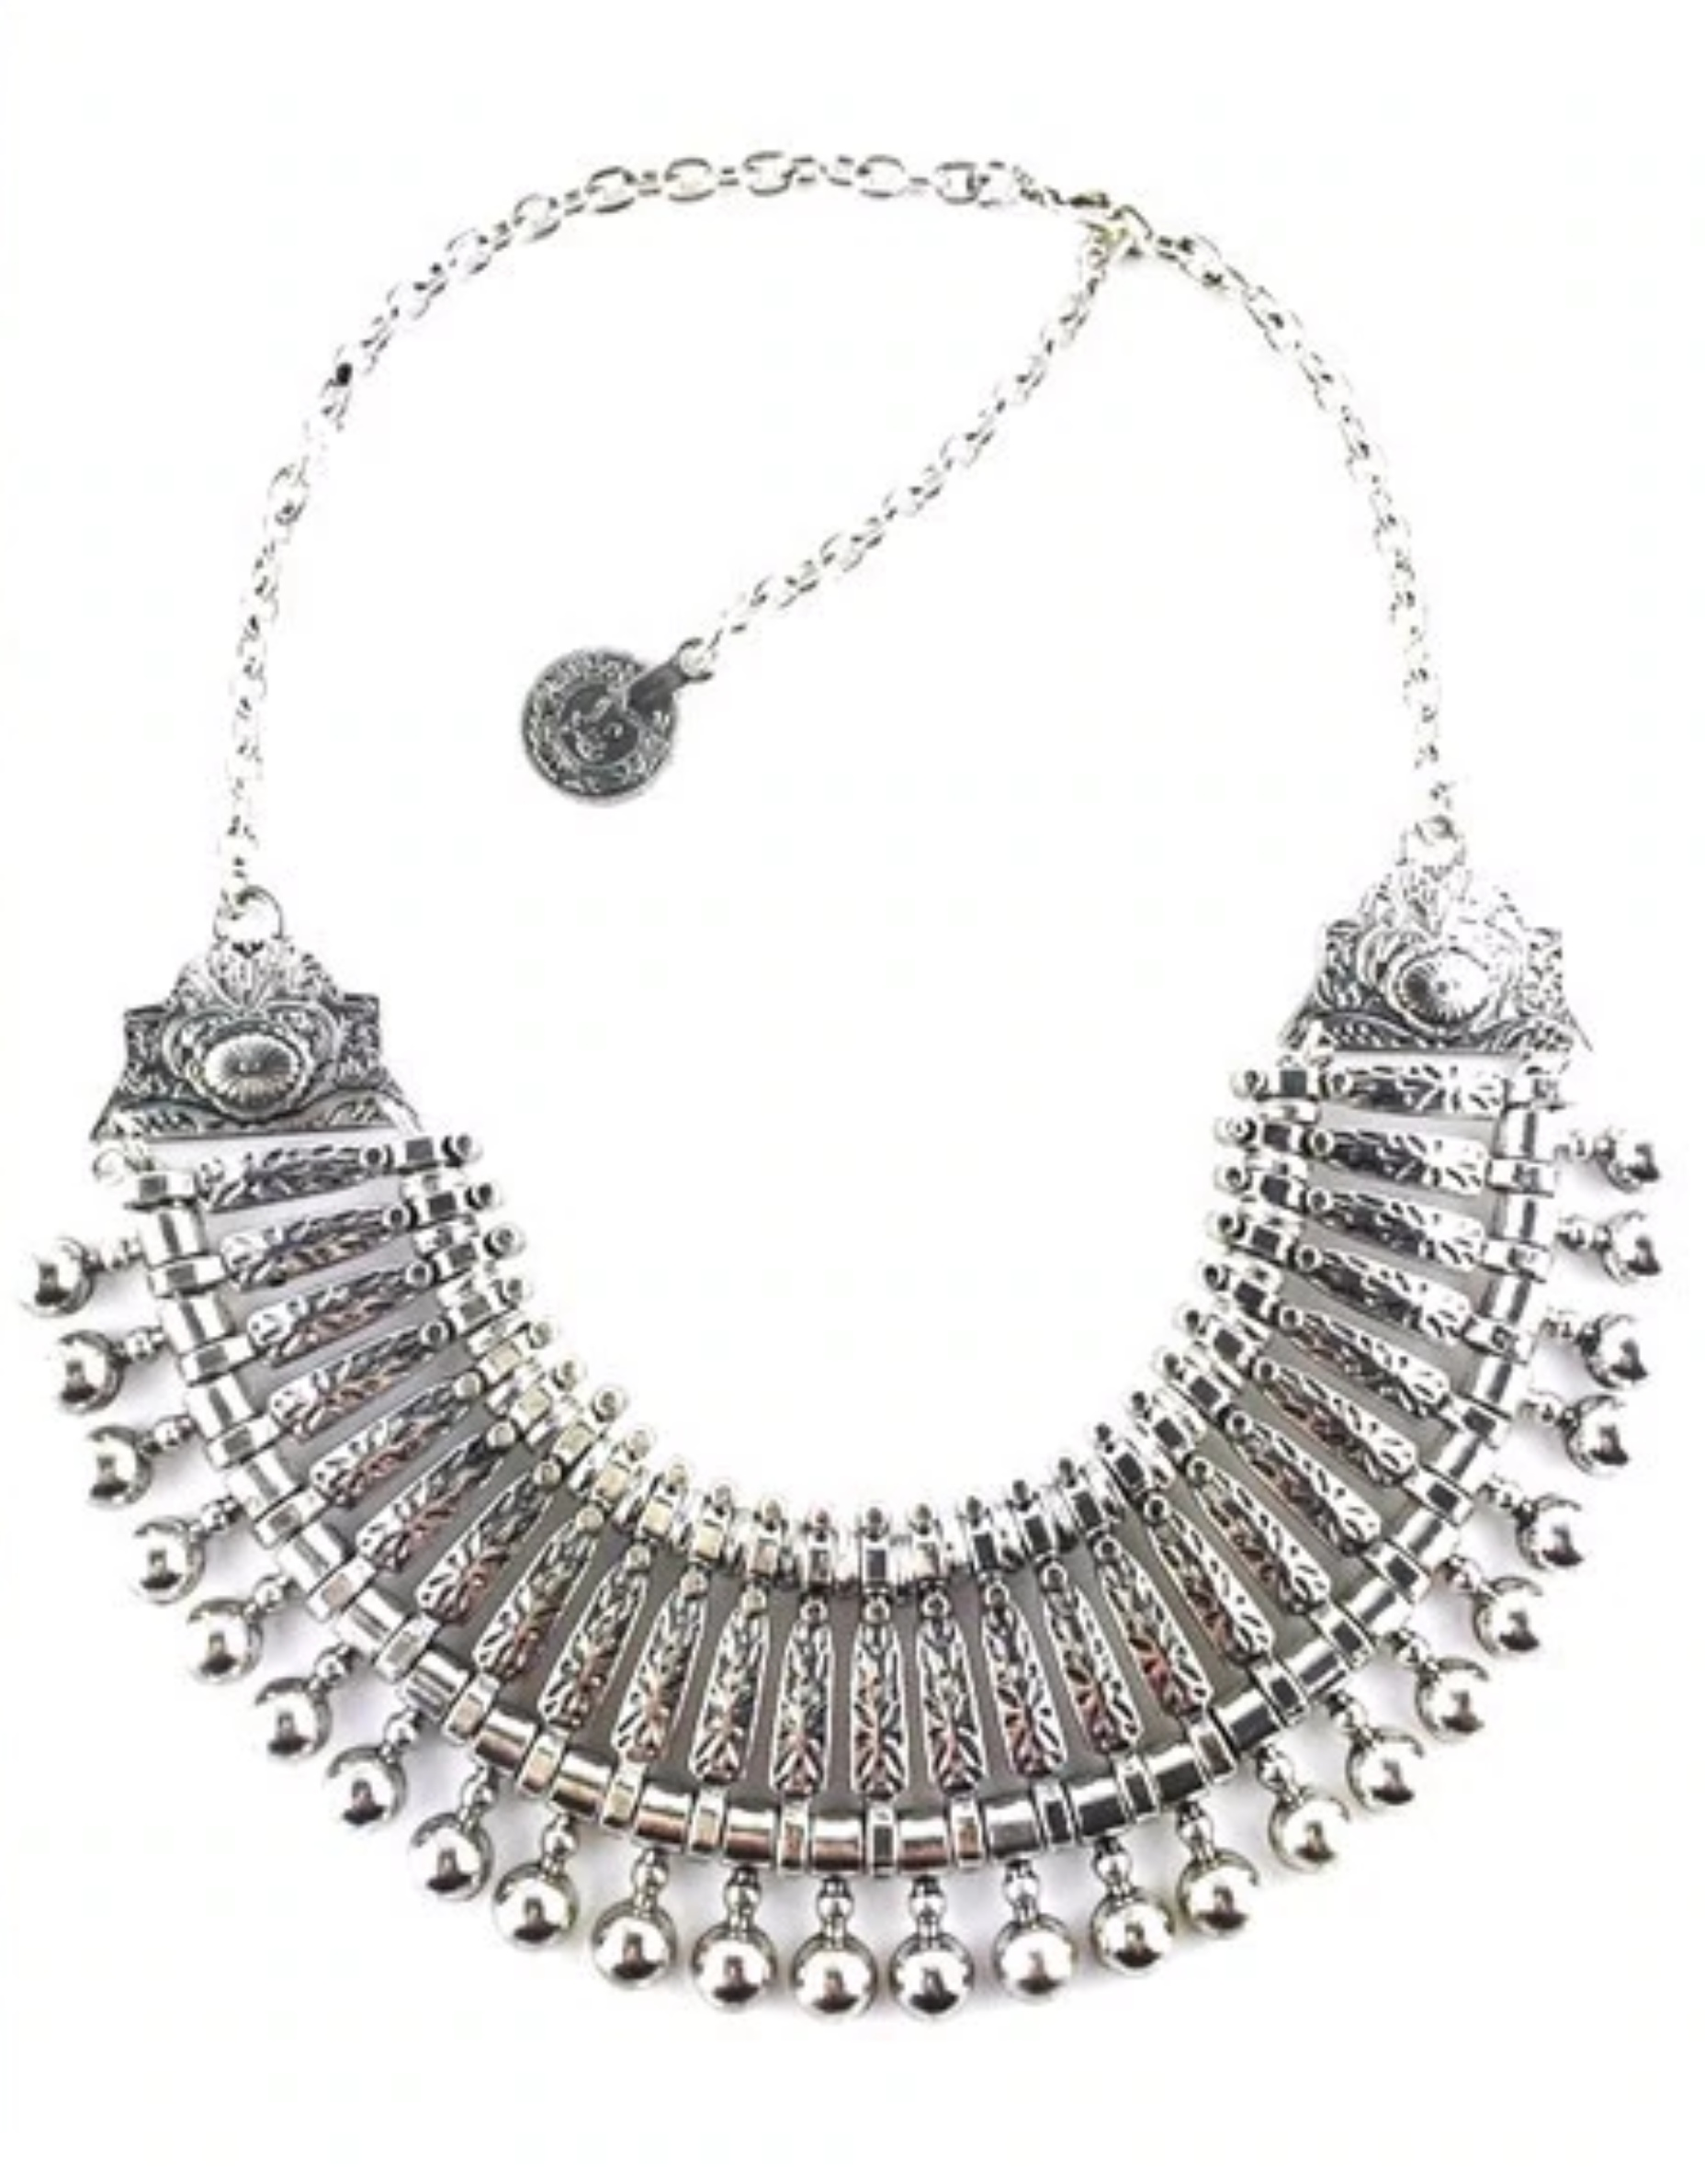 Mintmongoose Jewelry Subscription